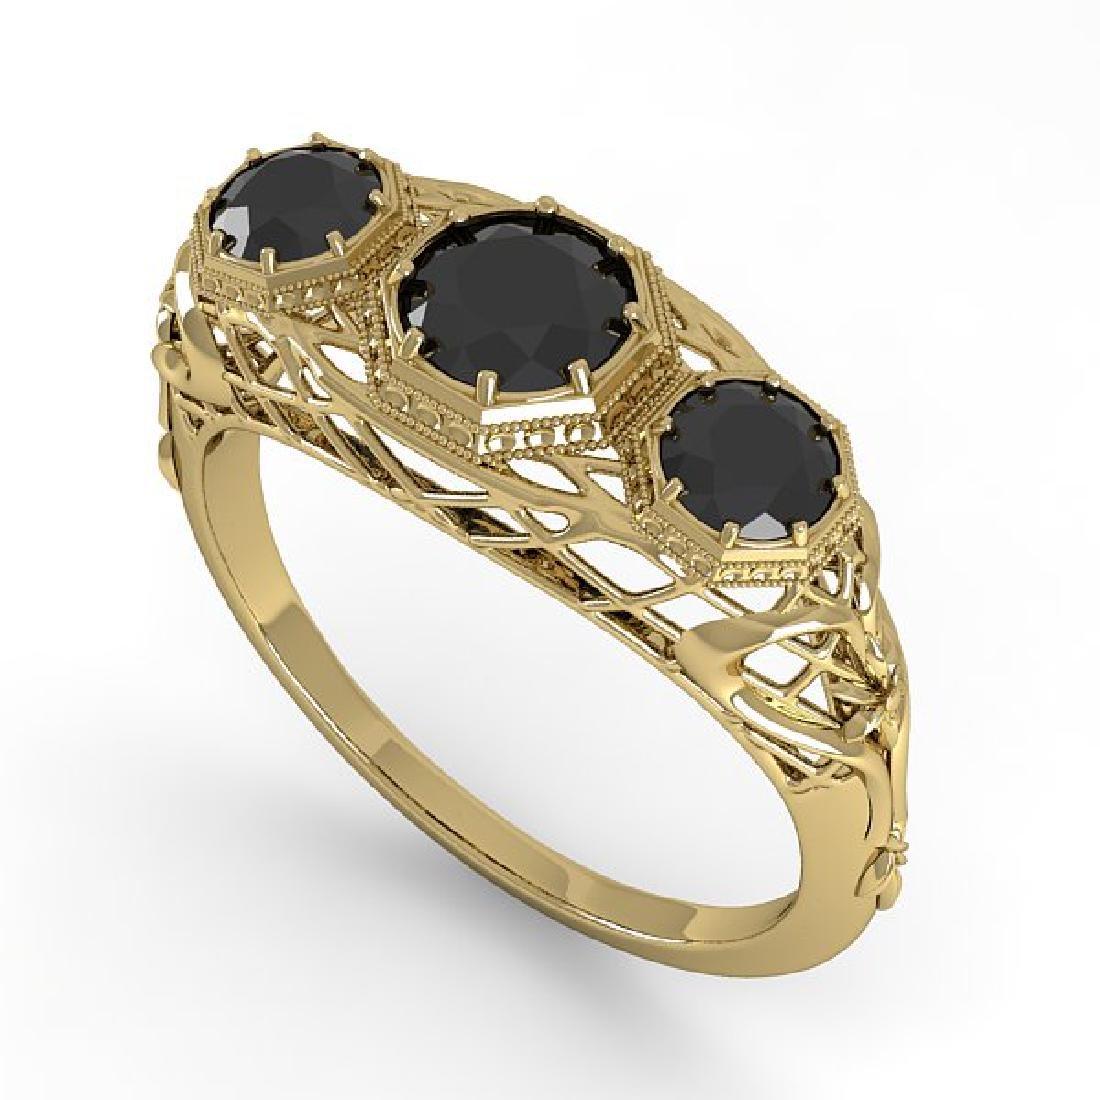 1.00 CTW Black Diamond Art Deco Ring 14K Yellow Gold - 2